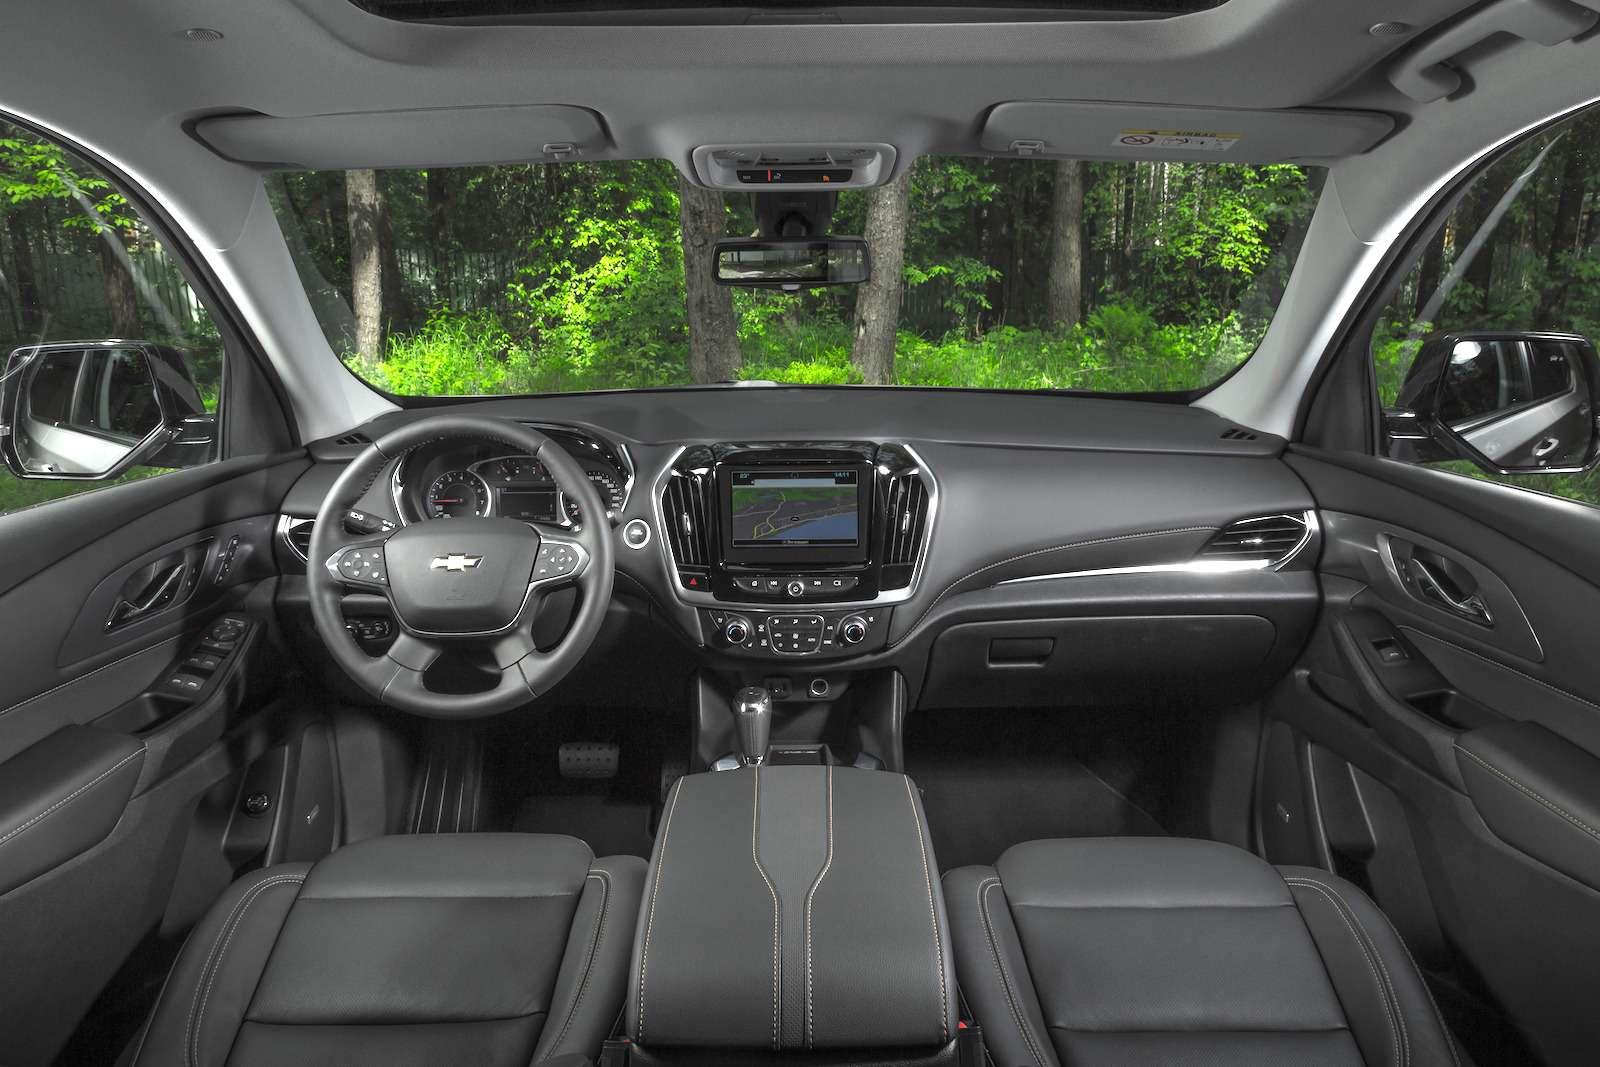 Тест-драйв Chevrolet Traverse: найти ребенка вбагажнике— фото 880712